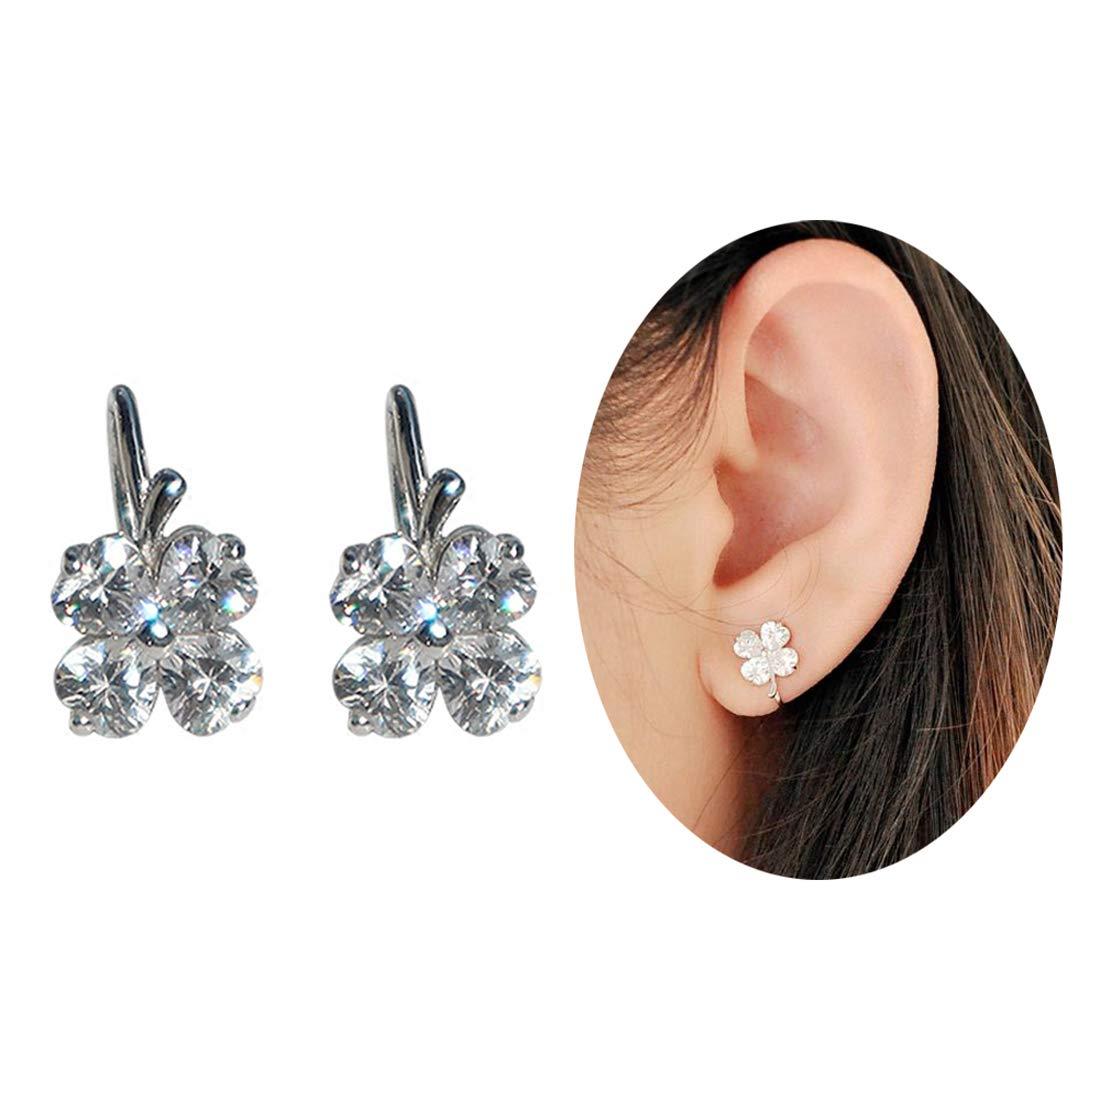 Aifeer Sterling Silver No Piercing Ear Cuffs Cubic Zirconia Four Leaf Clover U-Shaped Ear Clip On Earrings